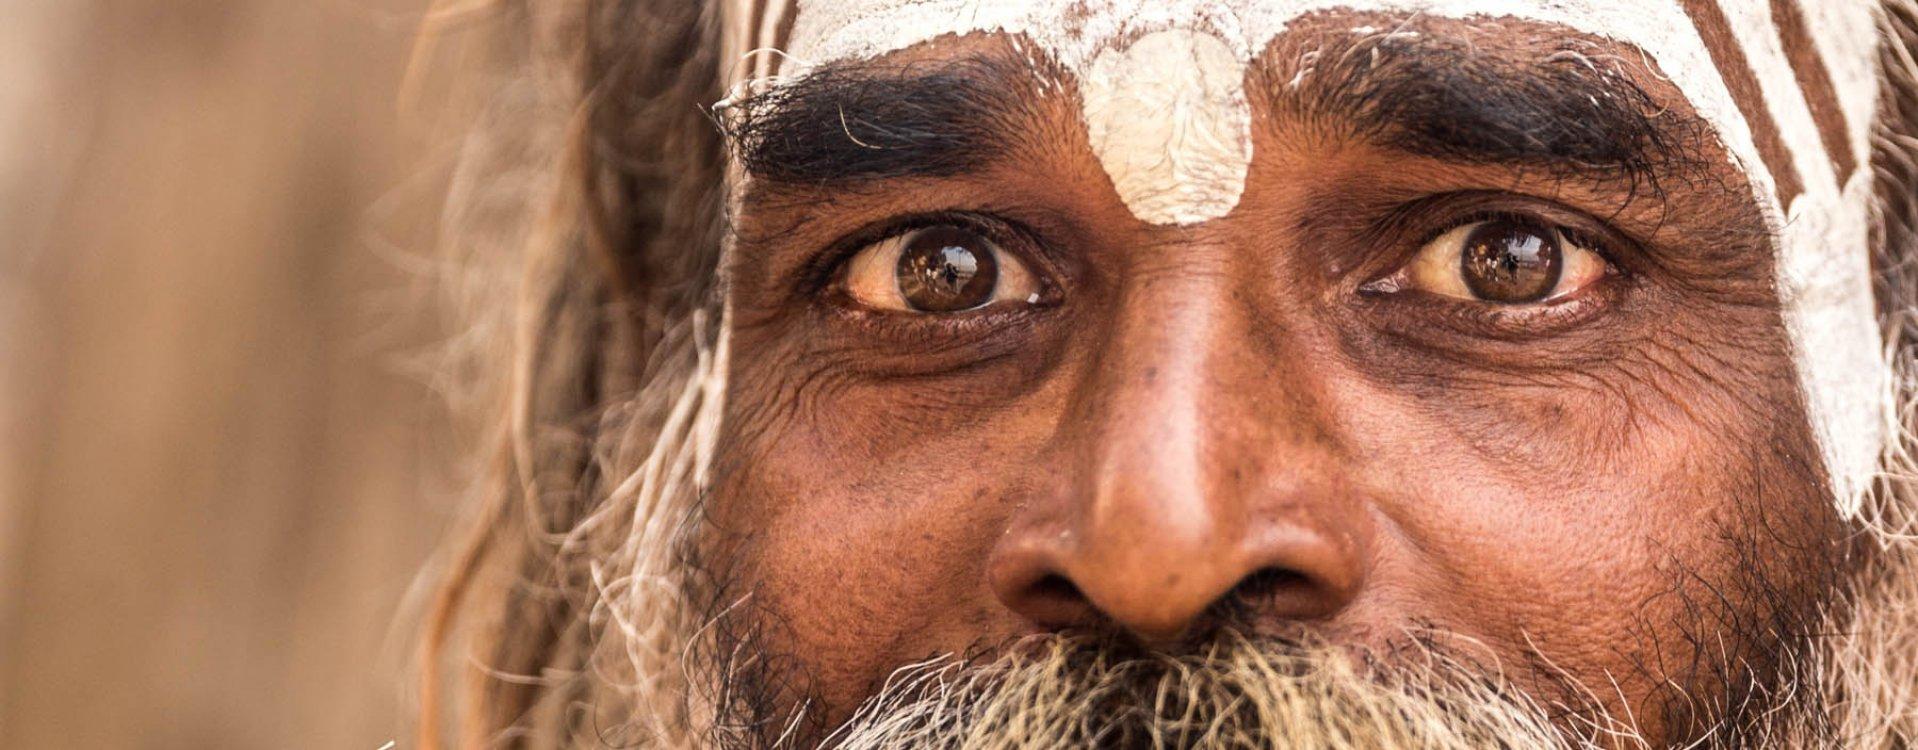 Hindoeïstische sadhoe